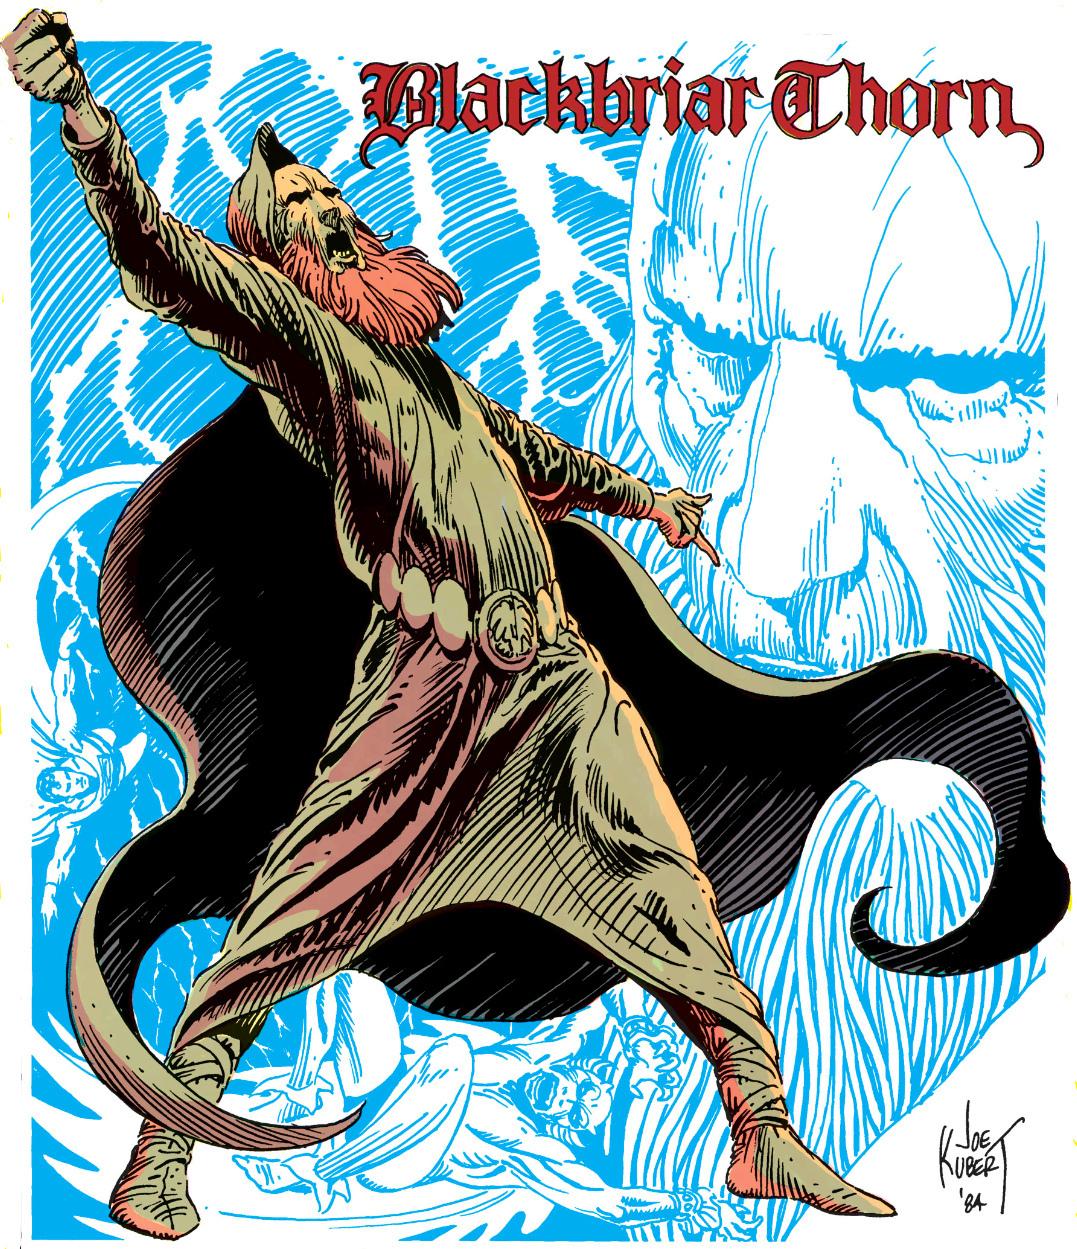 Blackbriar Thorn 001